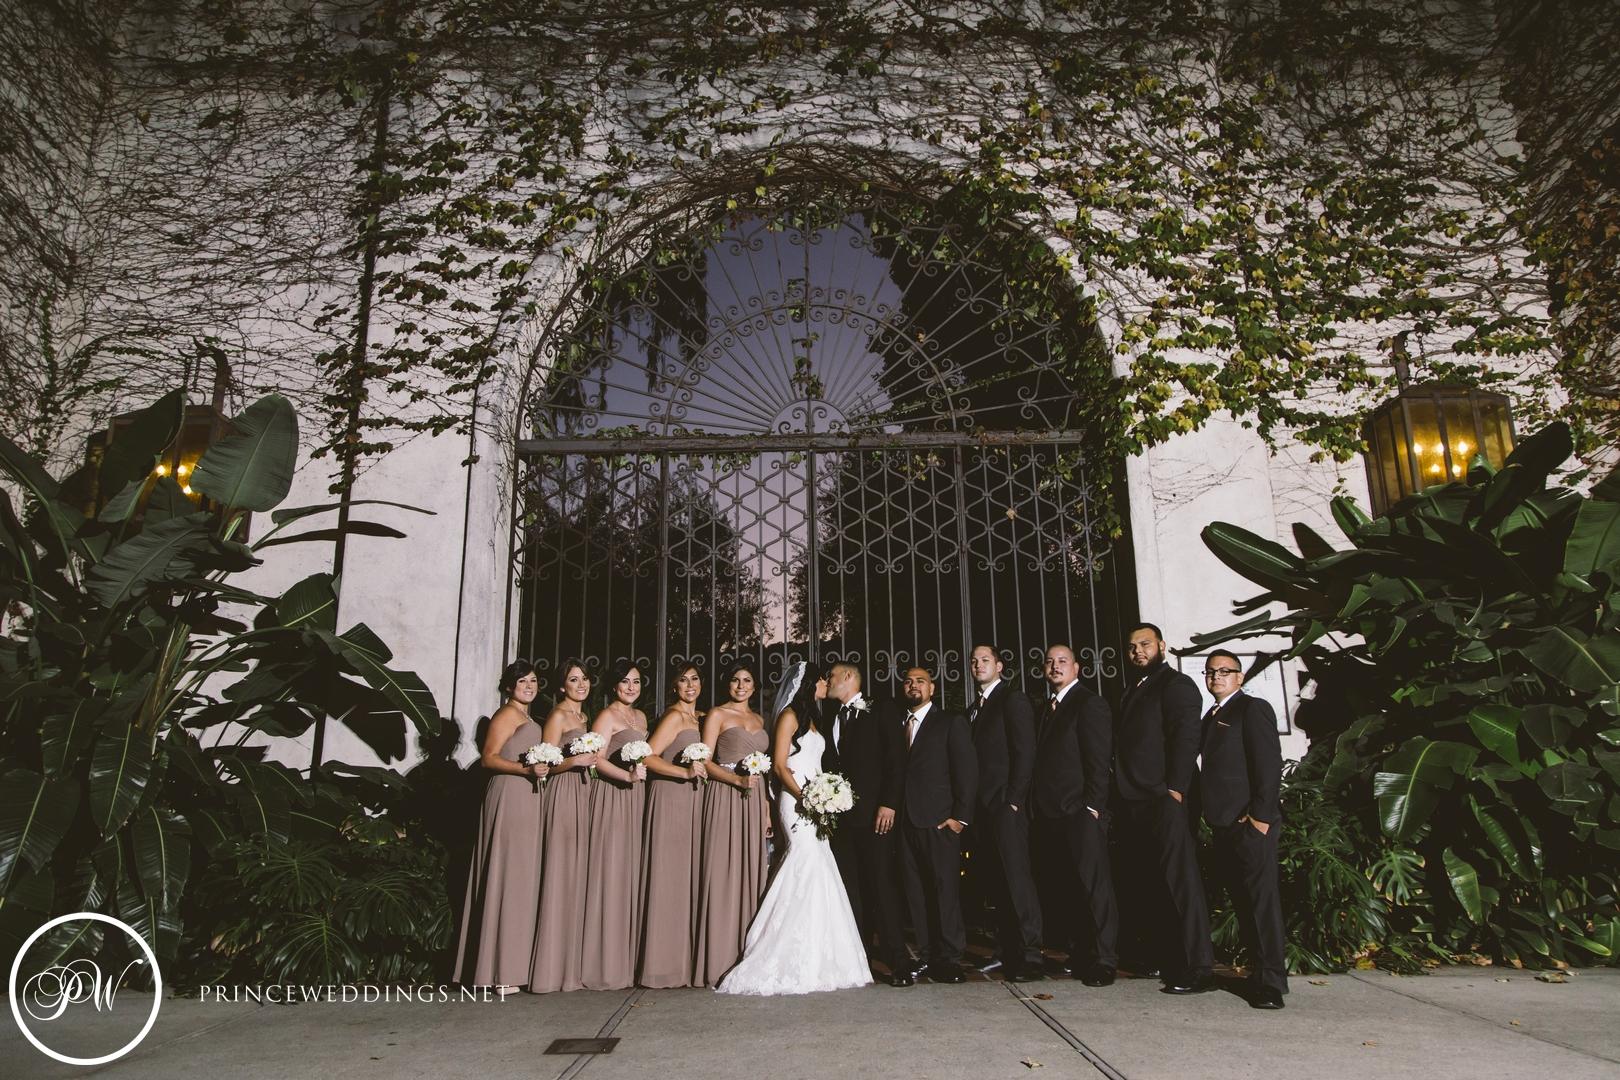 Los Angeles River Center & Gardens Wedding Photos-401.jpg